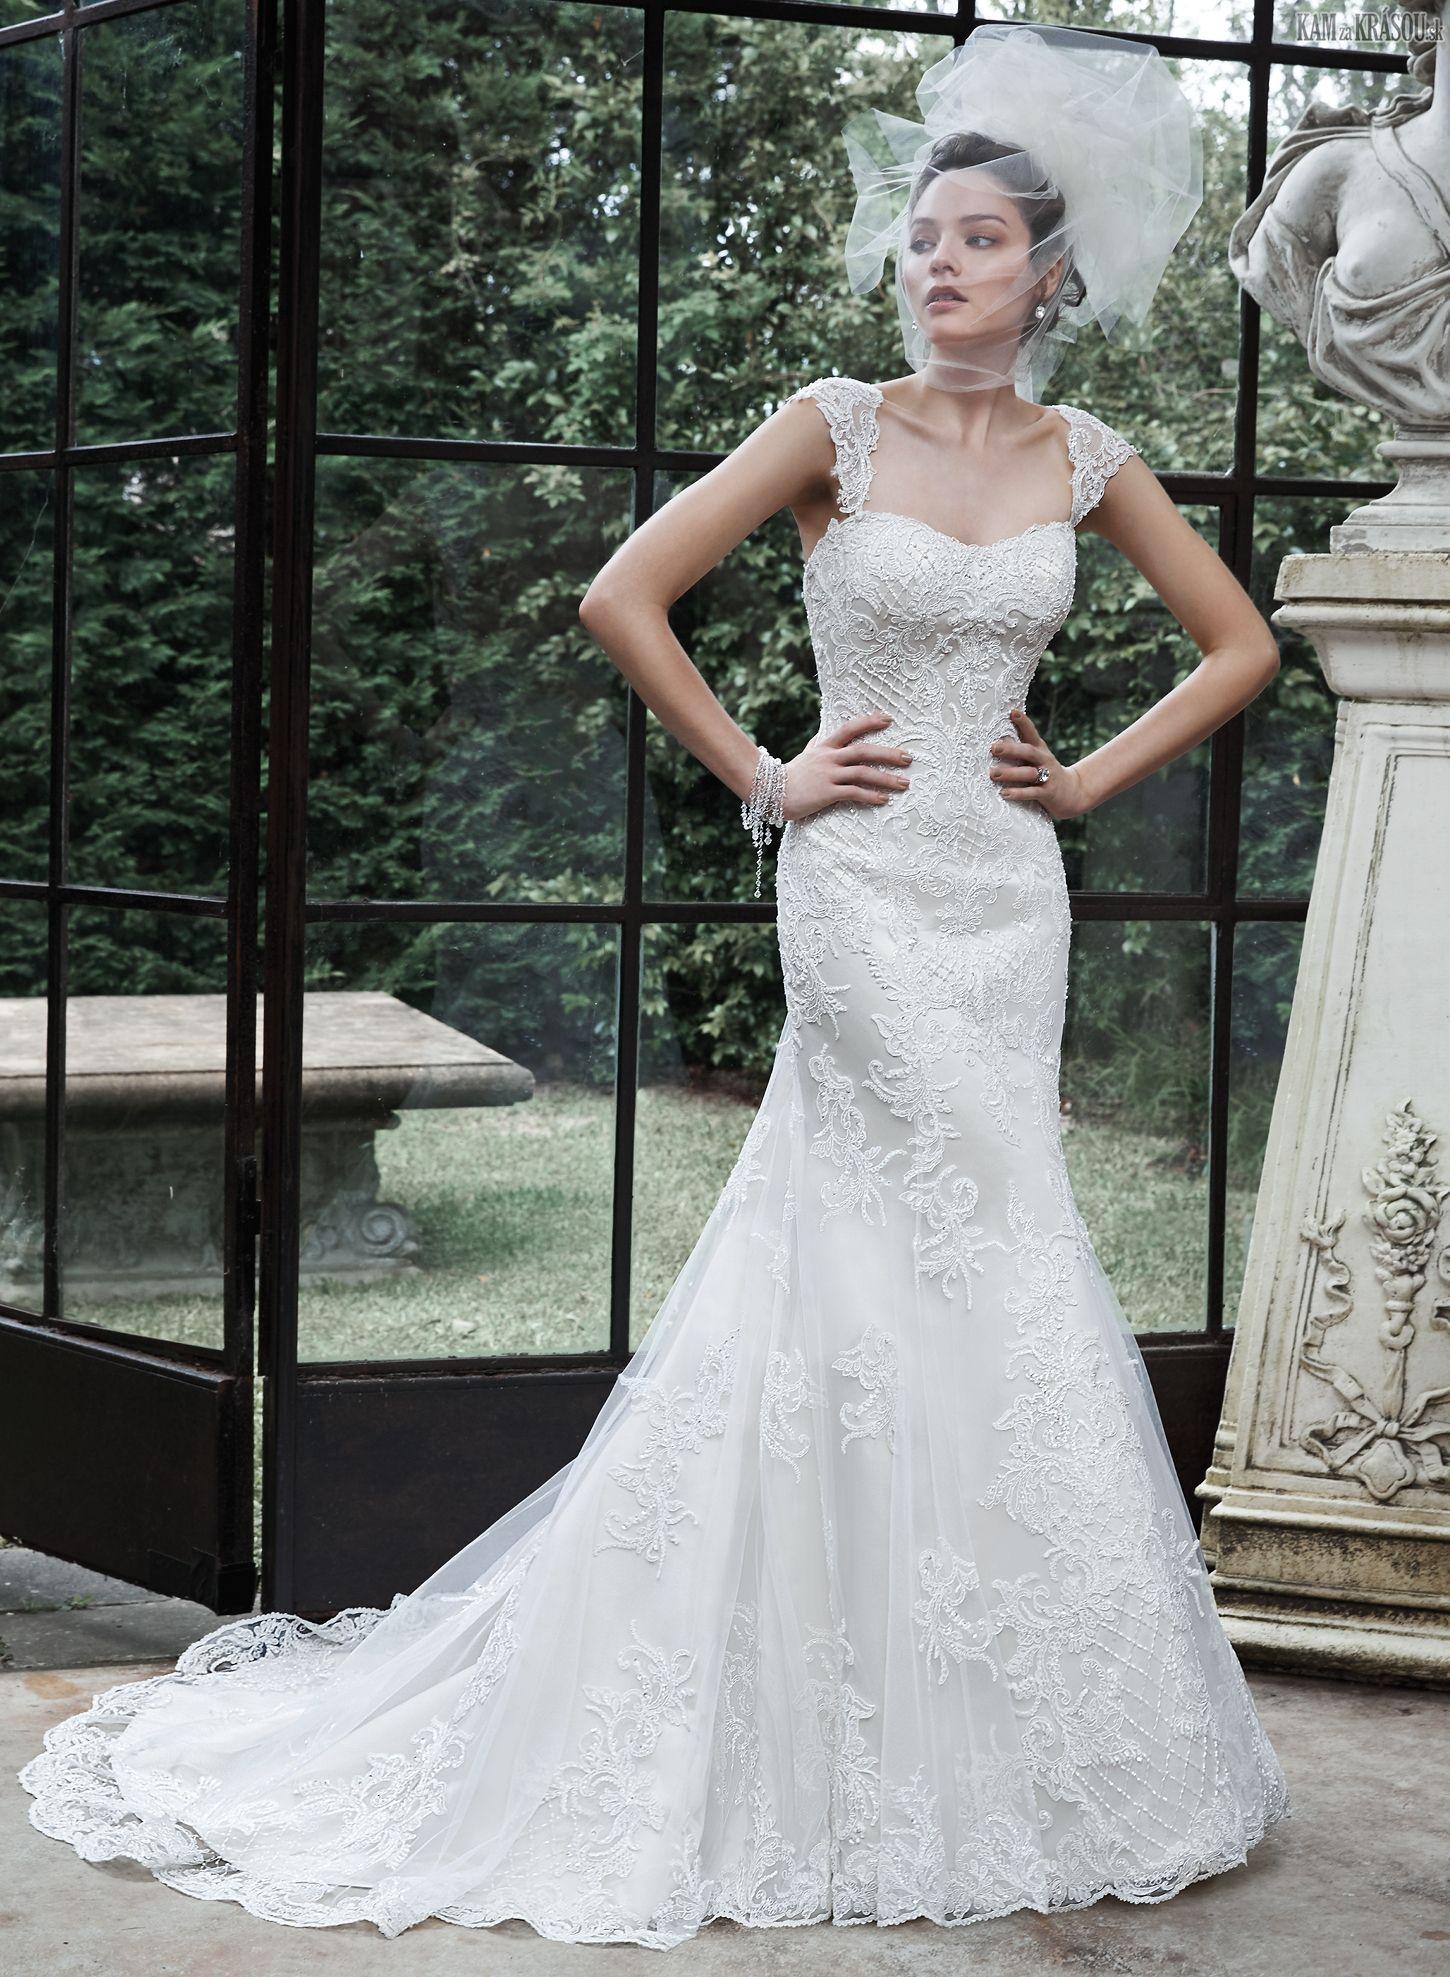 #kamzakrasou #sexi #love #jeans #clothes #coat #shoes #fashion #style #outfit #heels #bags #treasure #blouses #wedding #weddingdress #weddingday #weddingcelebration #weddingwoman svadobné šatý jeseň/zima 2015 kamzakrasou